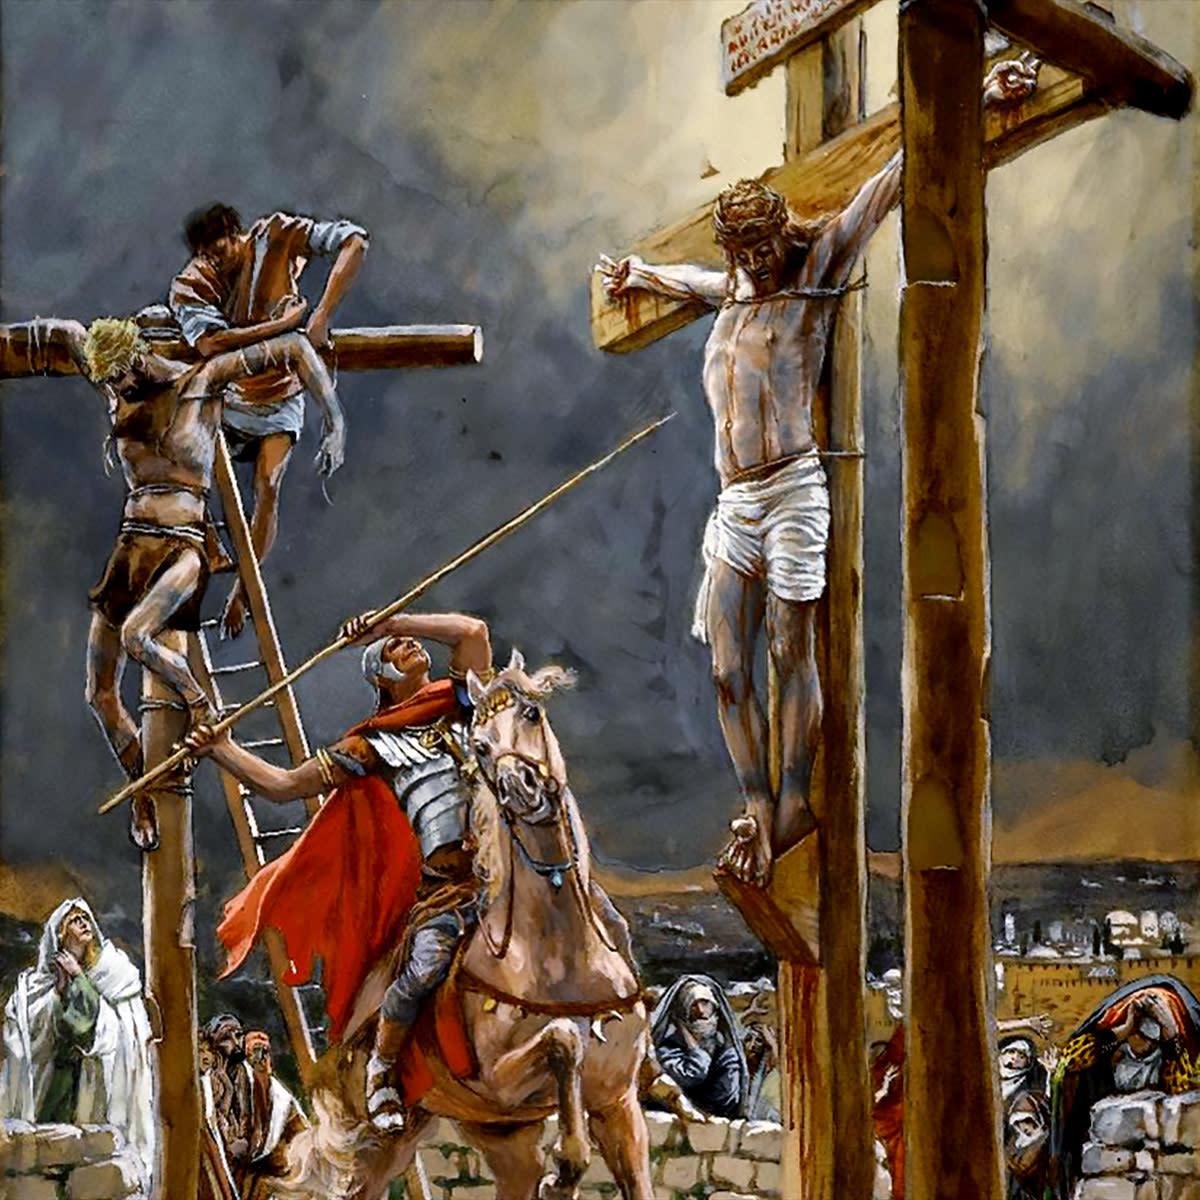 Christ-Bing Images